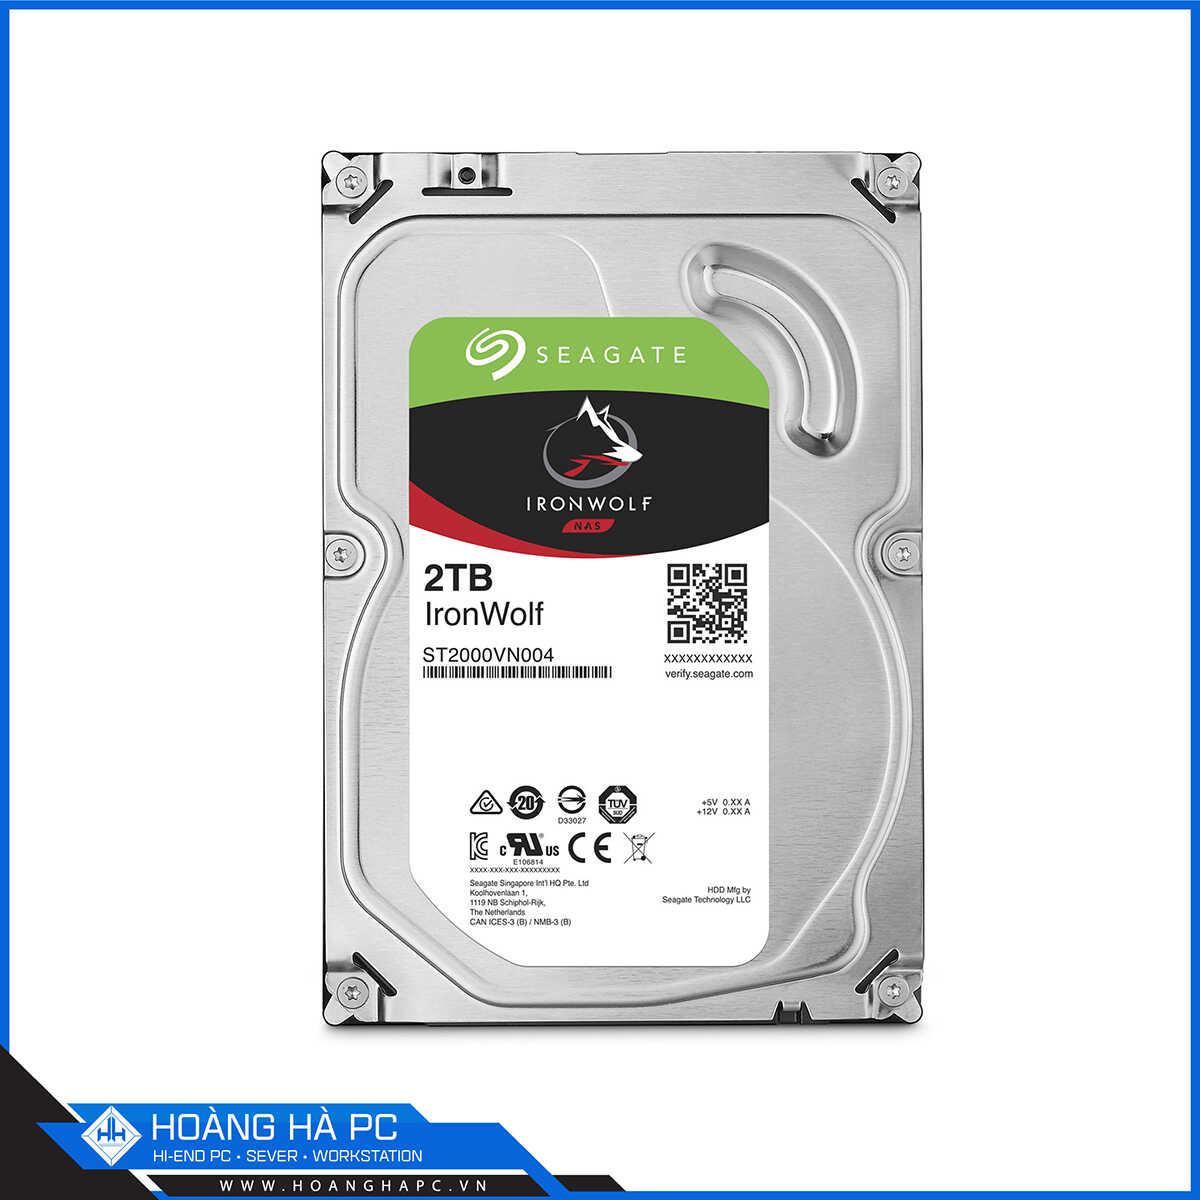 Ổ cứng HDD Seagate Ironwolf 2TB